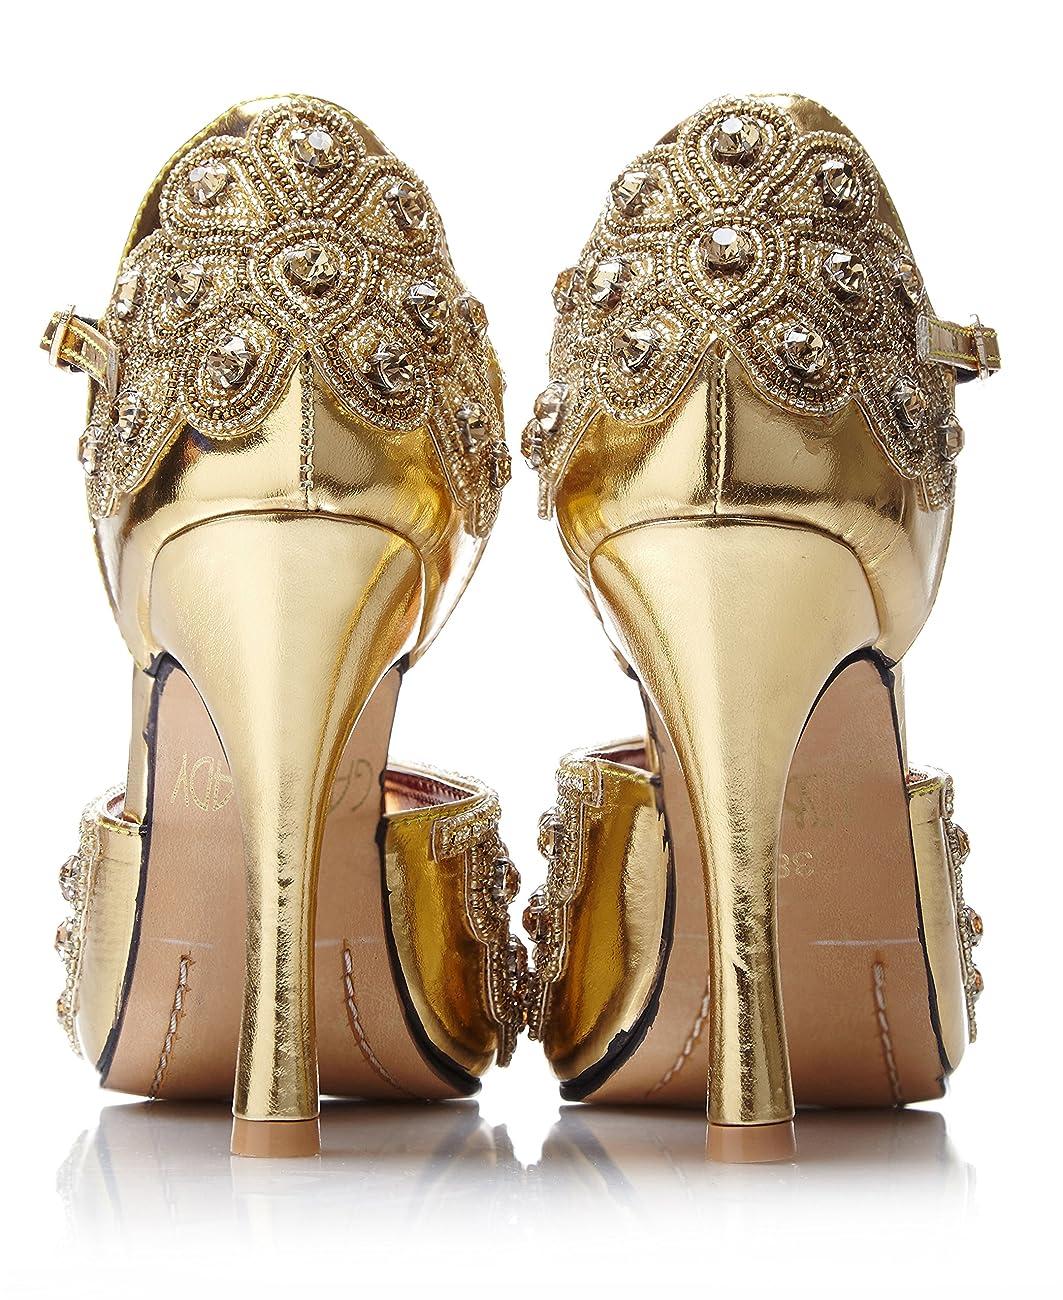 Donna Vintage Inspired T-Strap Heels in Gold 2